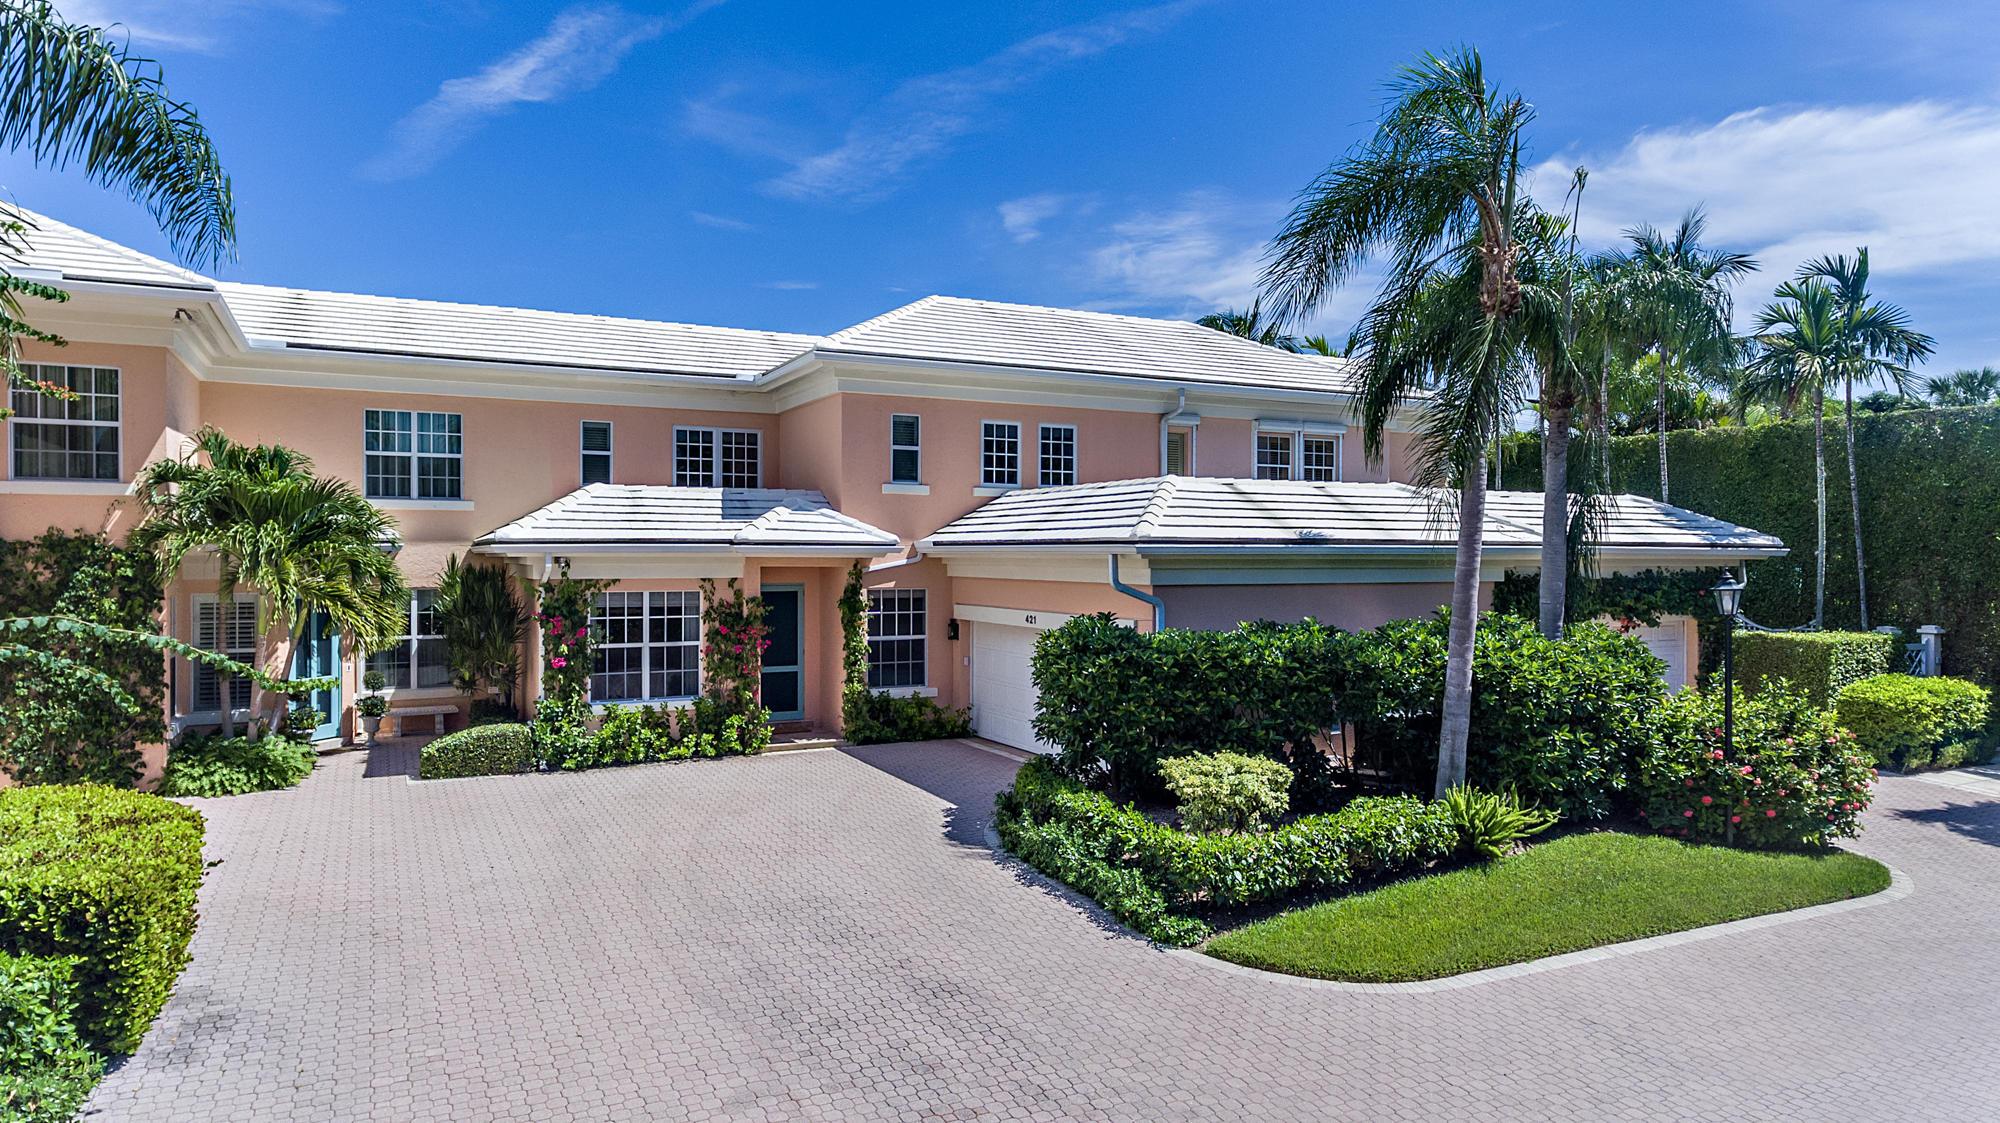 Photo of home for sale at 421 Brazilian Avenue, Palm Beach FL